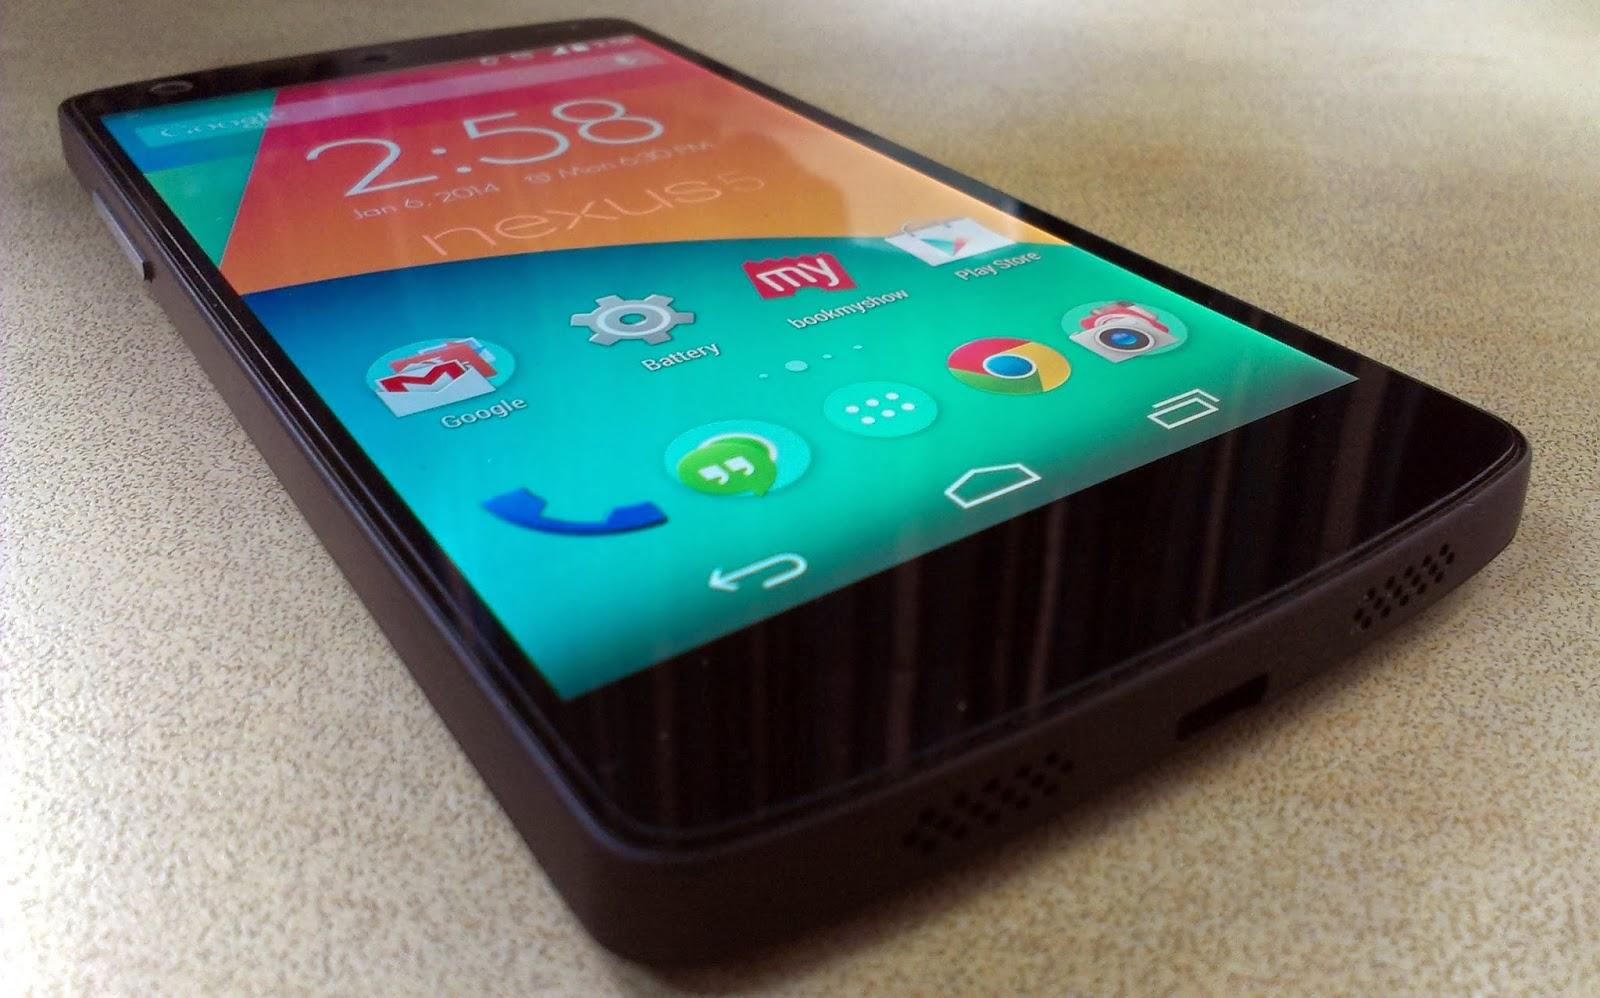 Google+LG+Nexus+5+Android+KitKat+Review+Handson+Detailed+Benchmark++%25284%2529.jpg